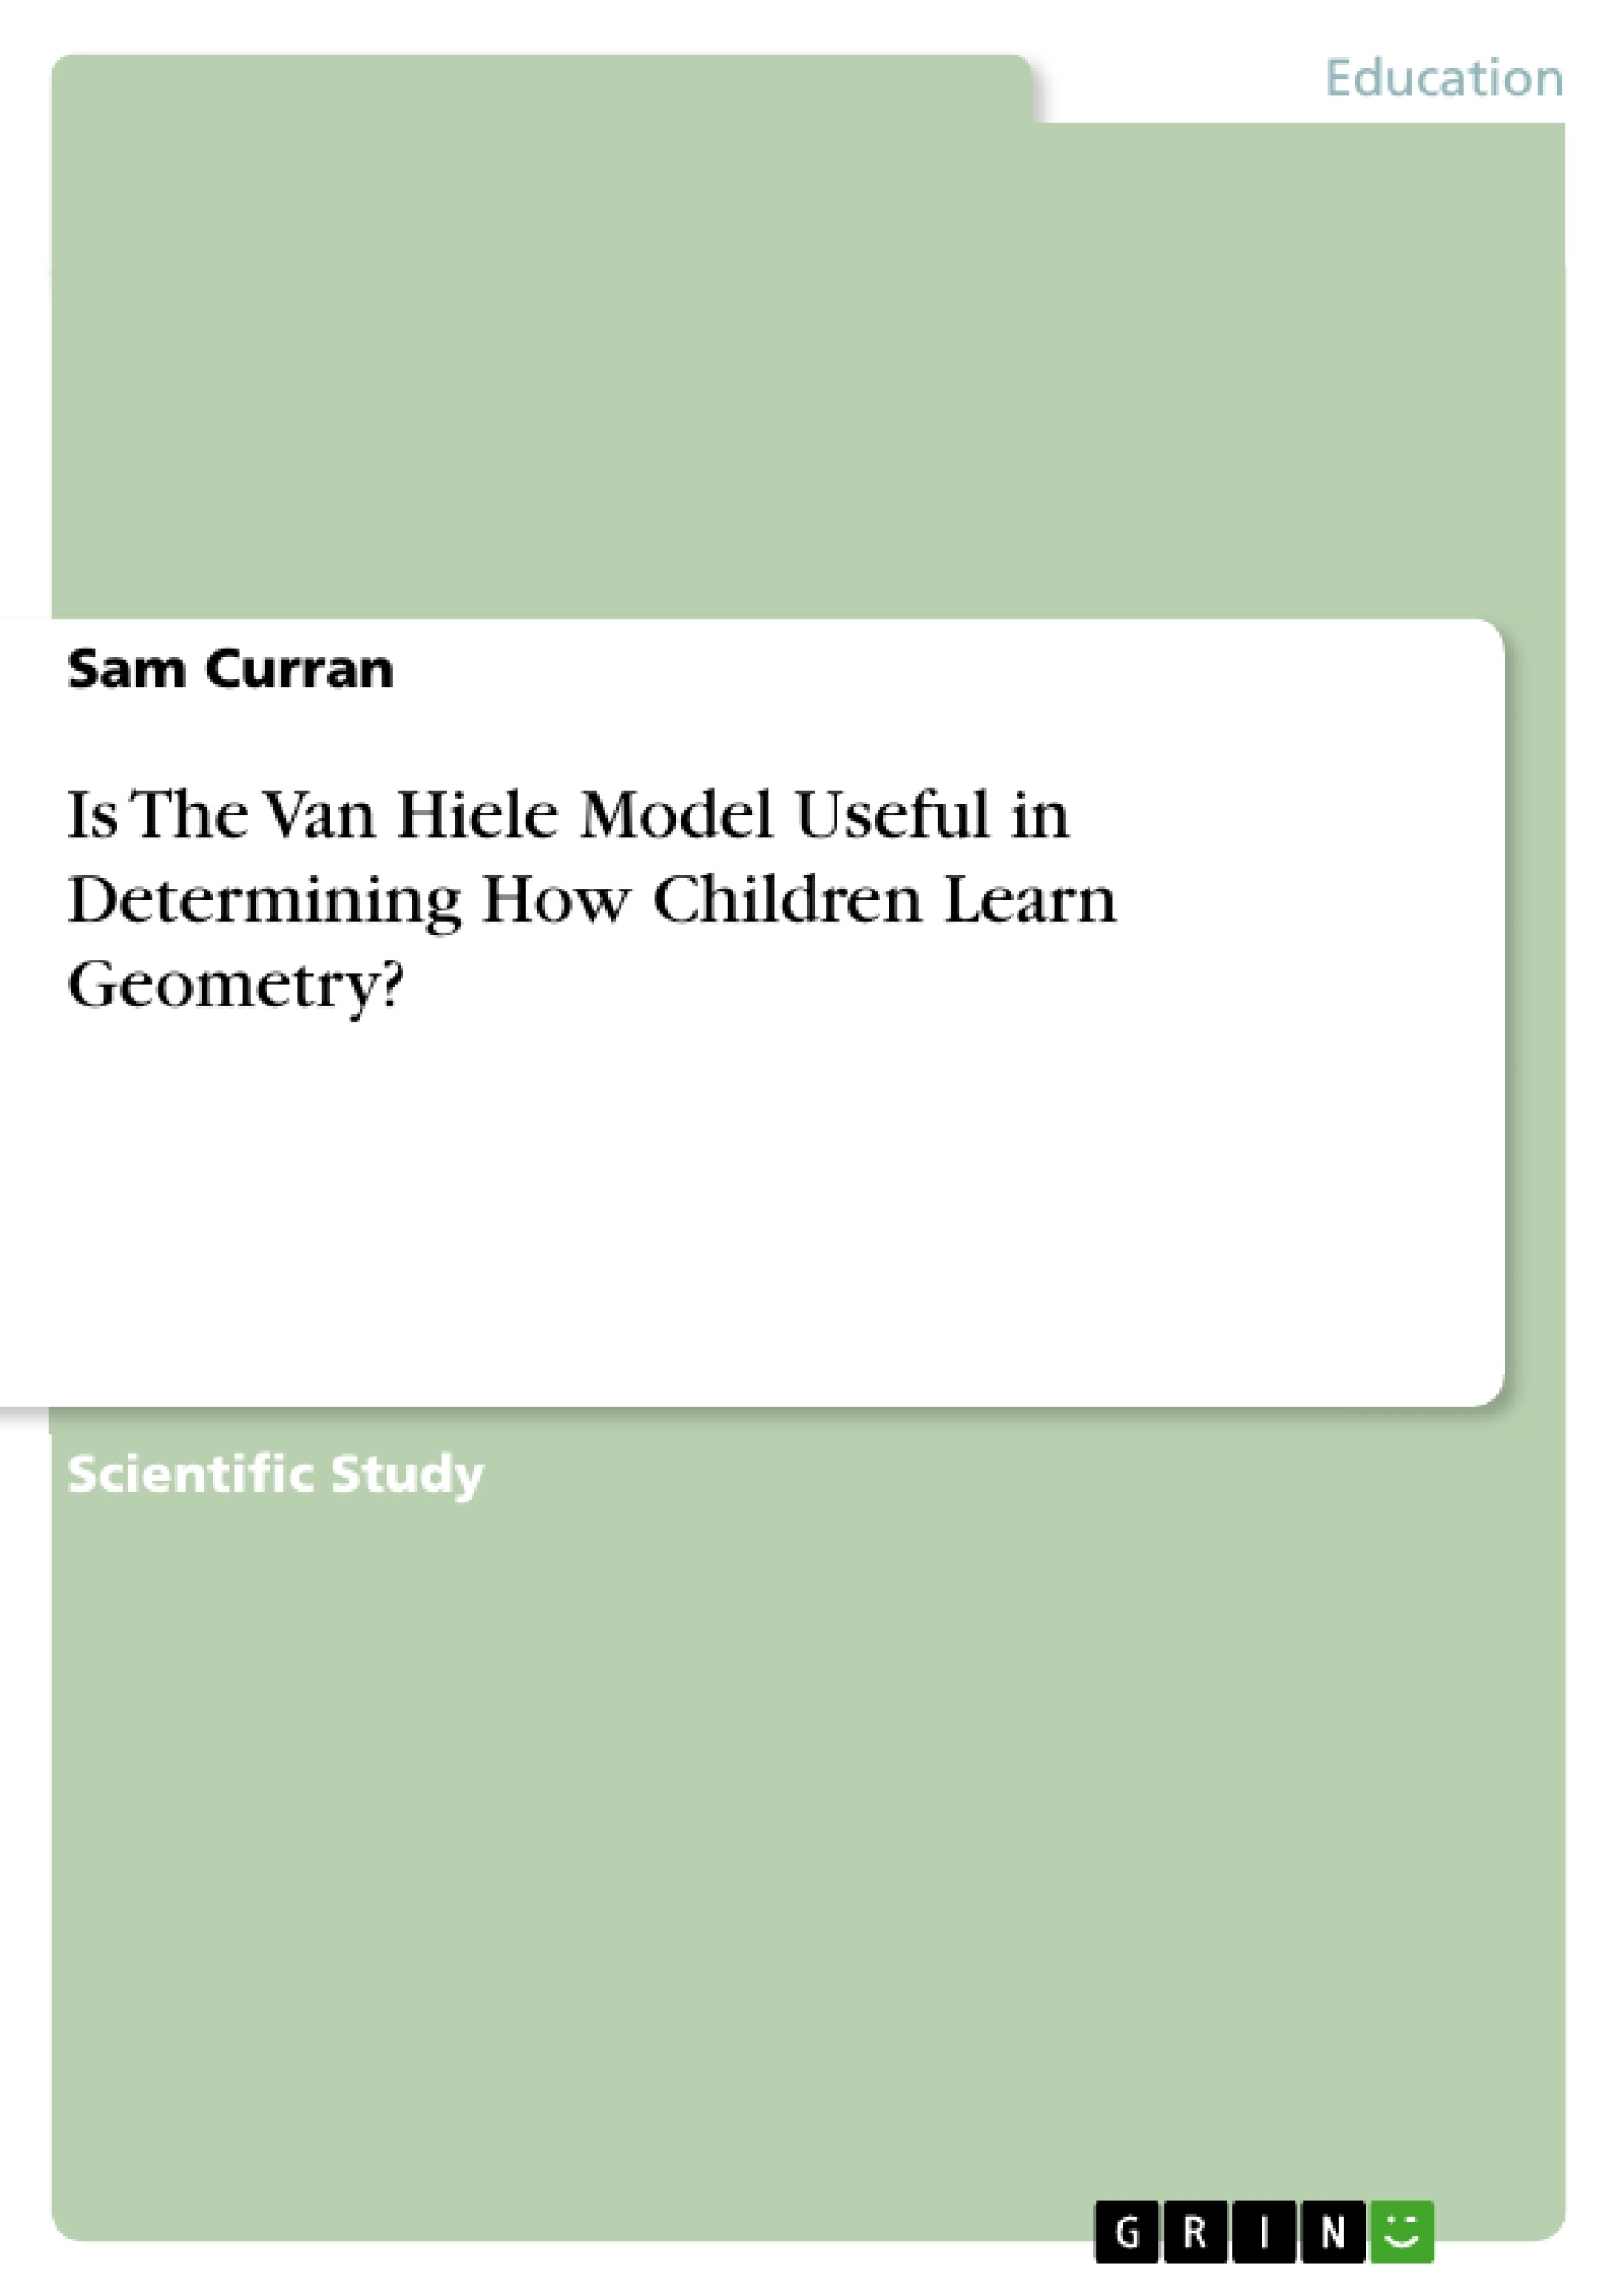 Title: Is The Van Hiele Model Useful in Determining How Children Learn Geometry?